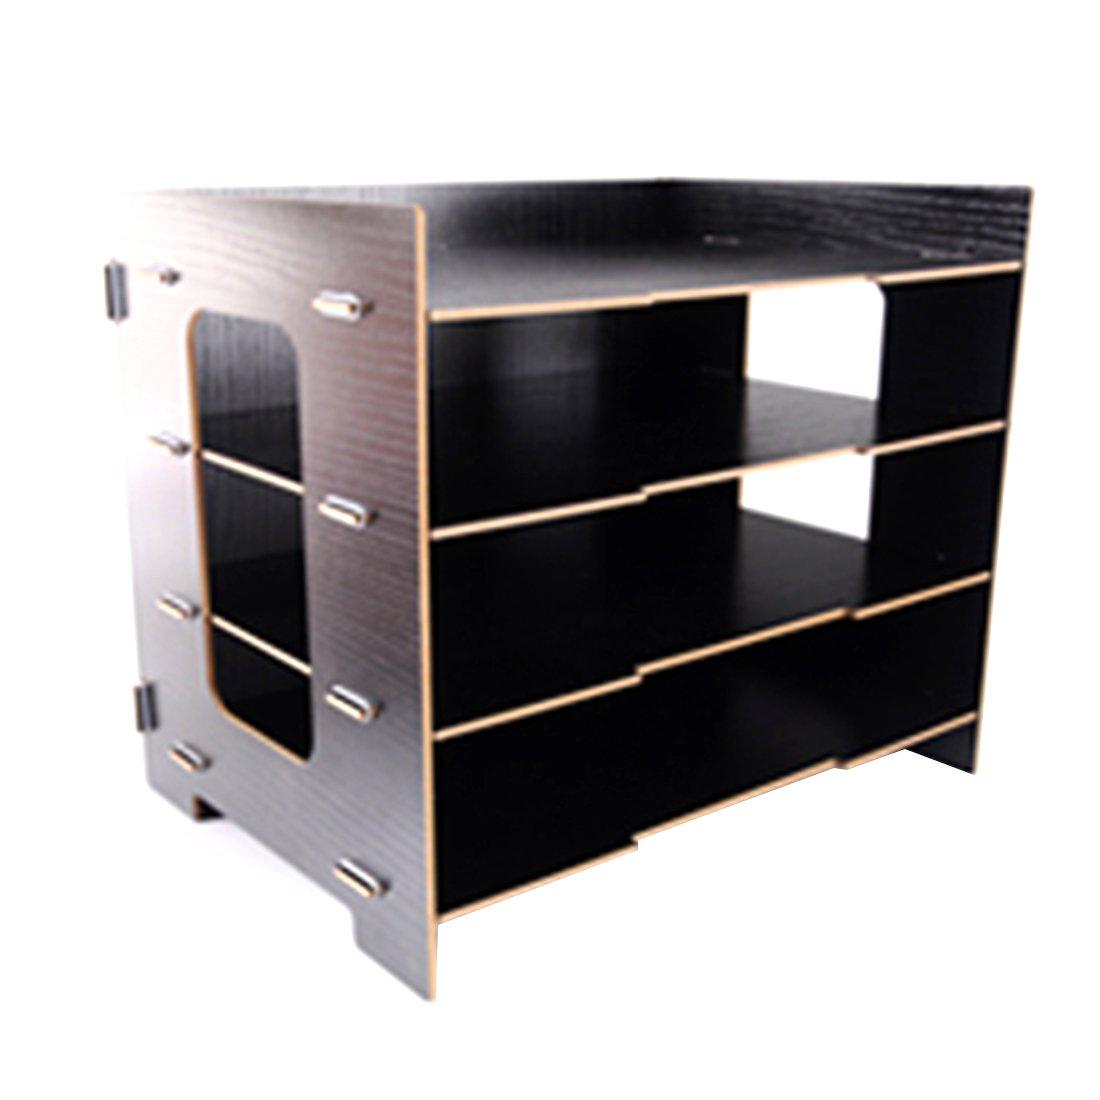 Storage Rack, FenglinTech Four-layer Tabletop Wood Storage Rack Durable Office Sill Simple Desktop Organizer Shelf for Books Documents - (Black)